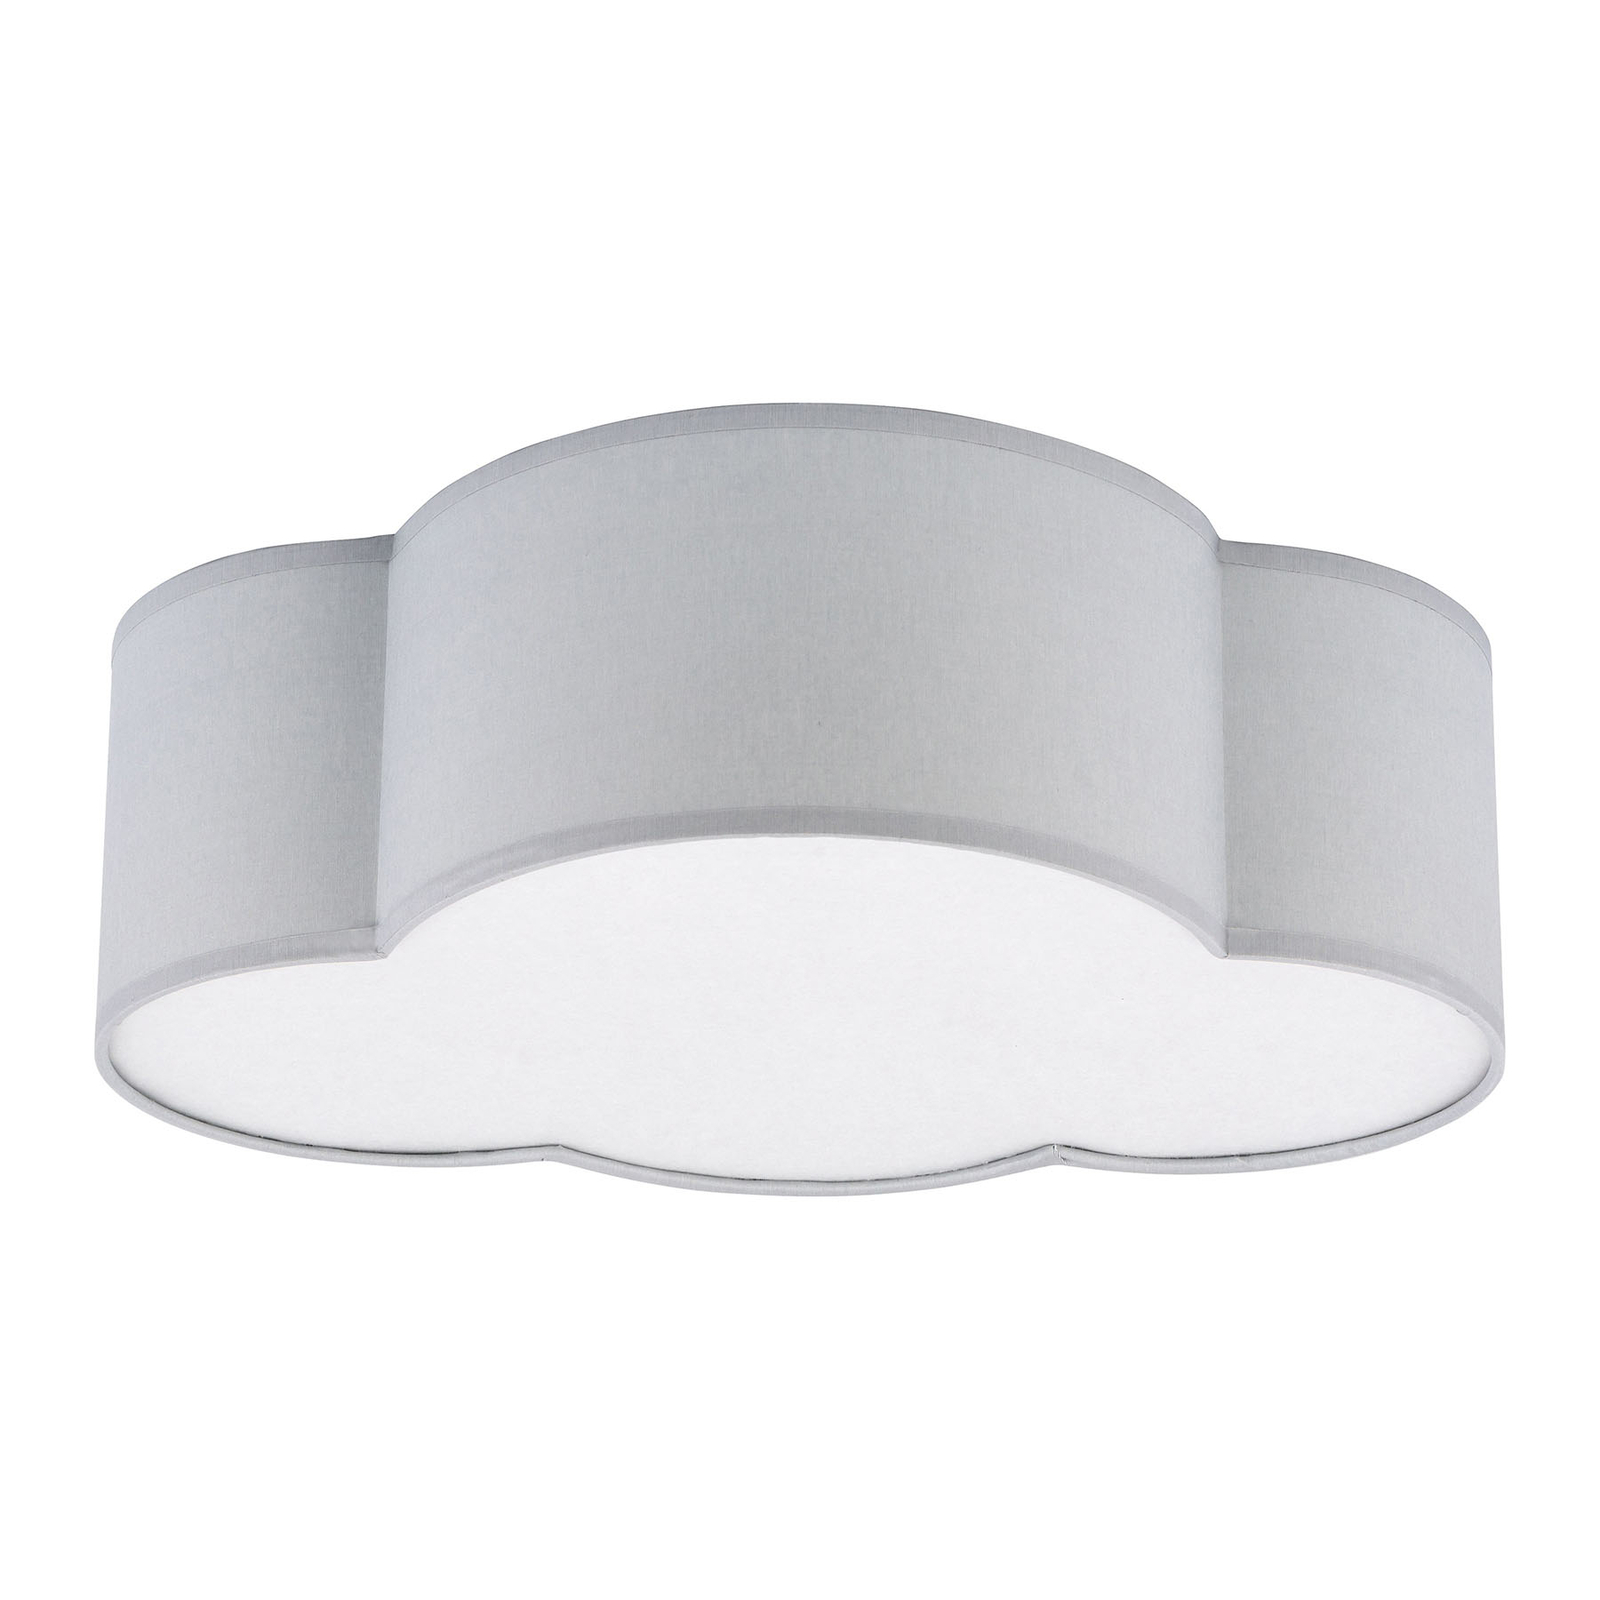 Plafondlamp Cloud van textiel, lengte 41 cm, grijs